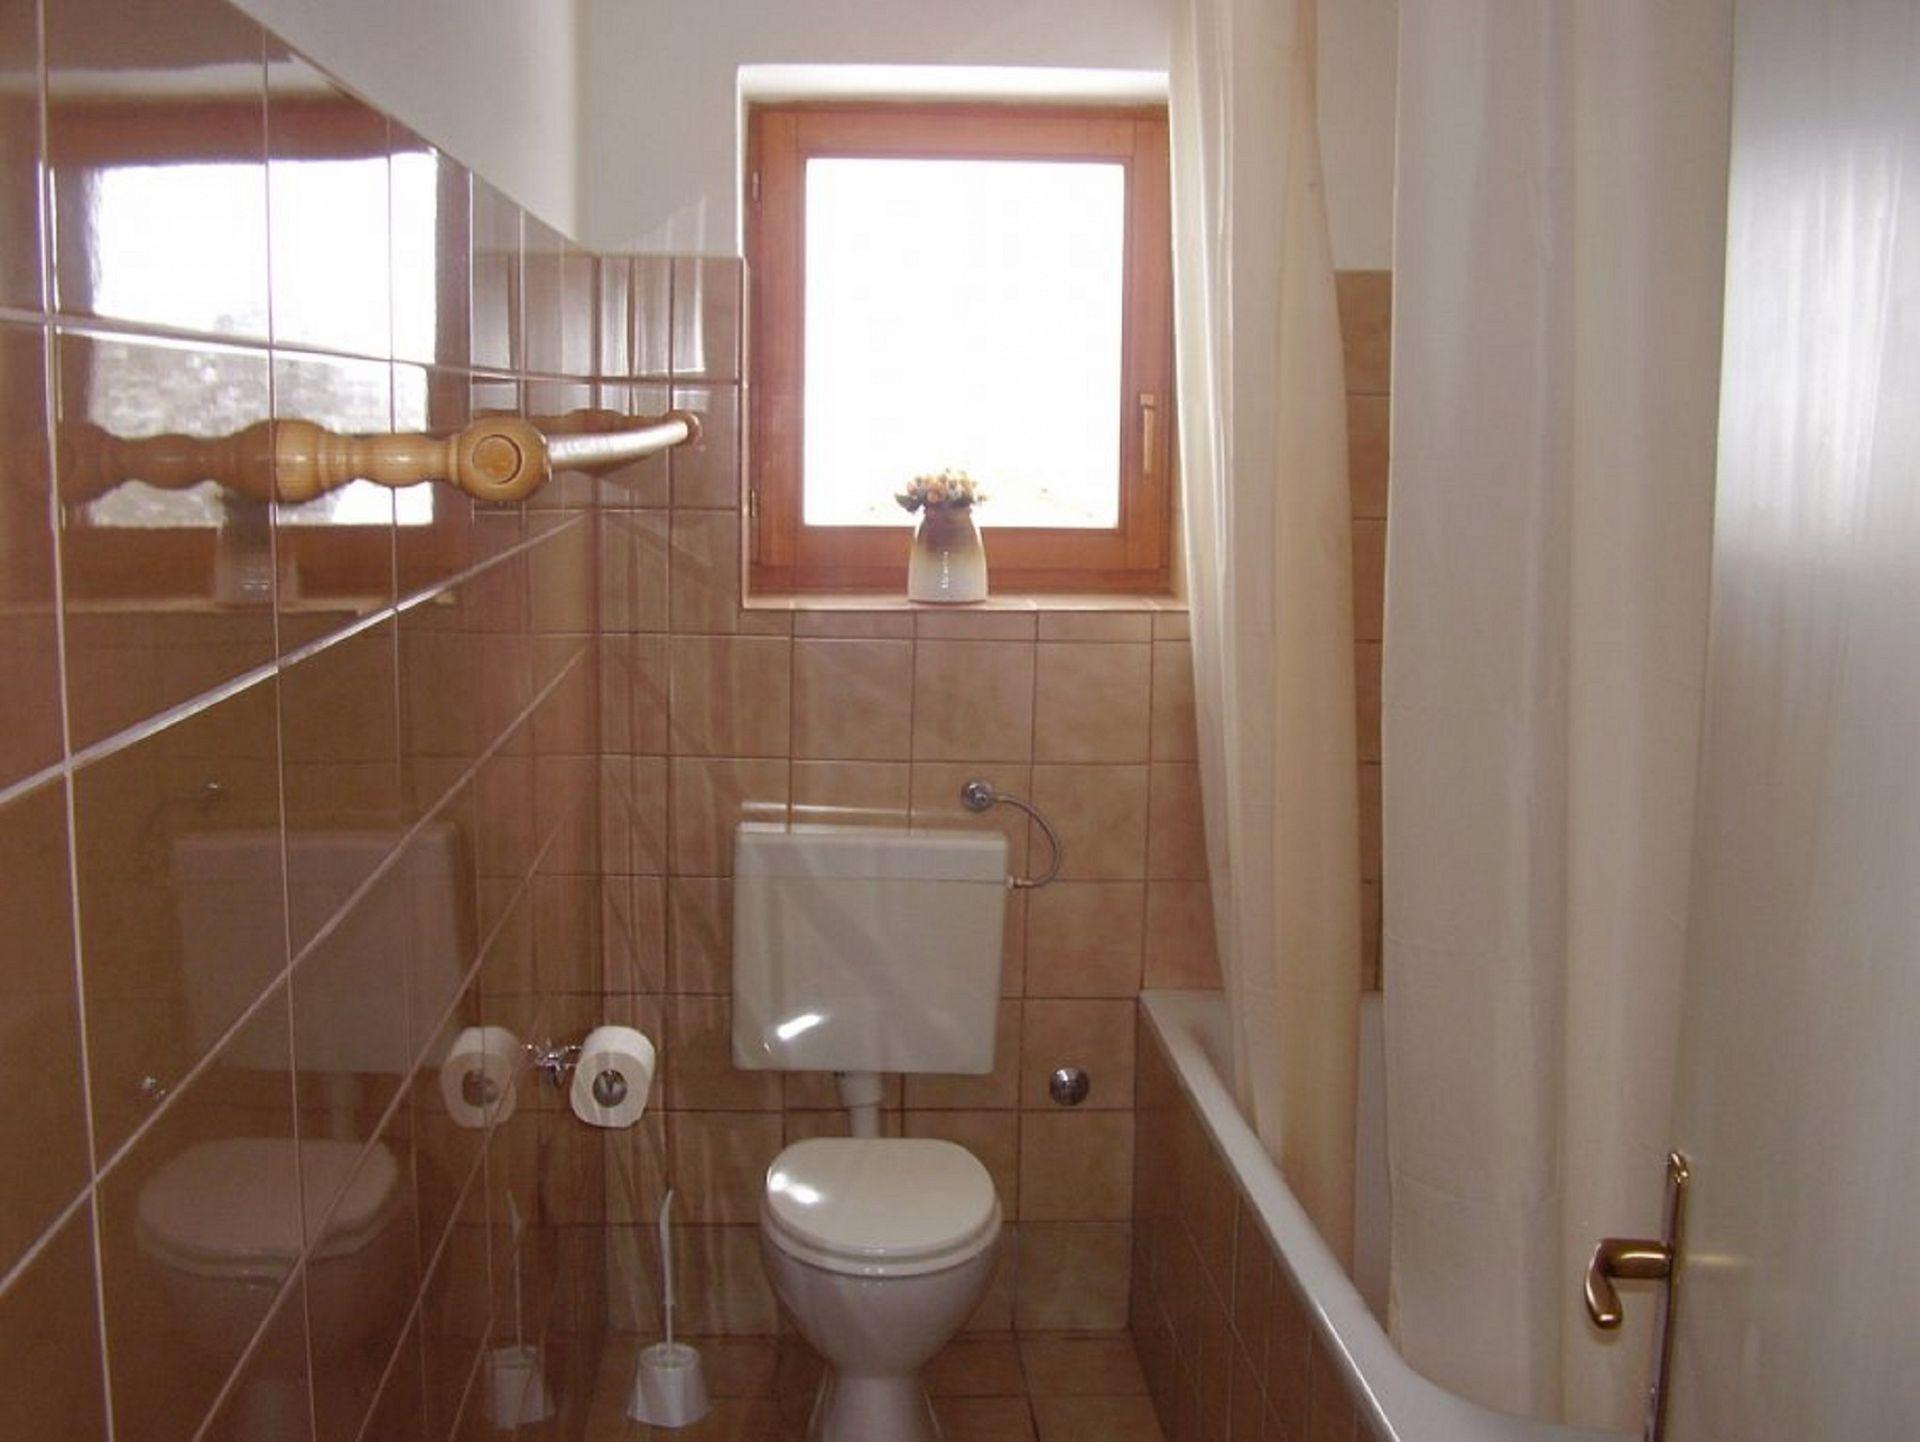 Biserka - Gacka dolina - Maisons de repos, villas Croatie - H(4+2): salle de bain W-C